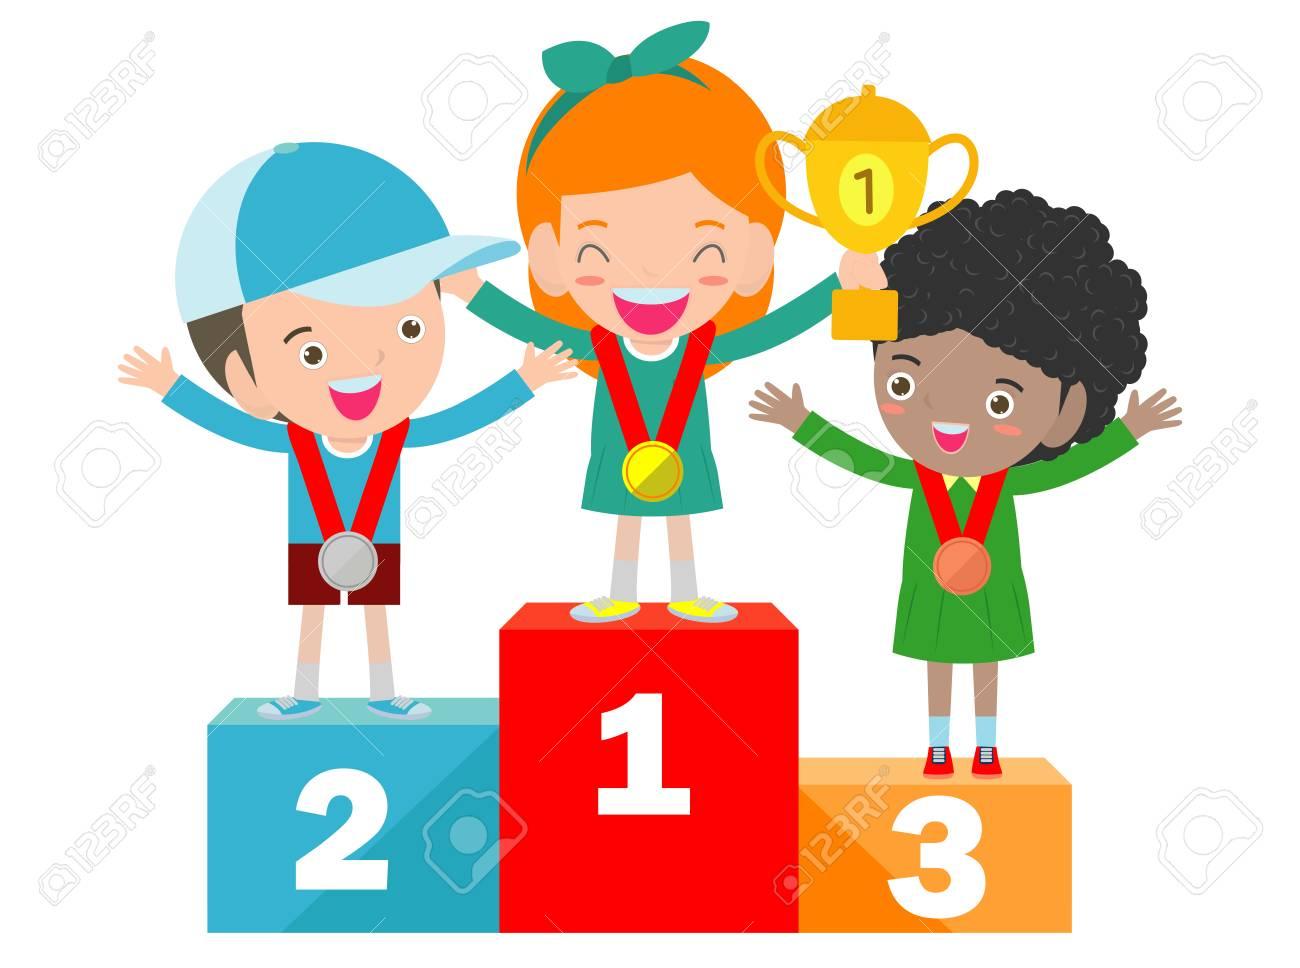 Image result for children cartoon winning at sports